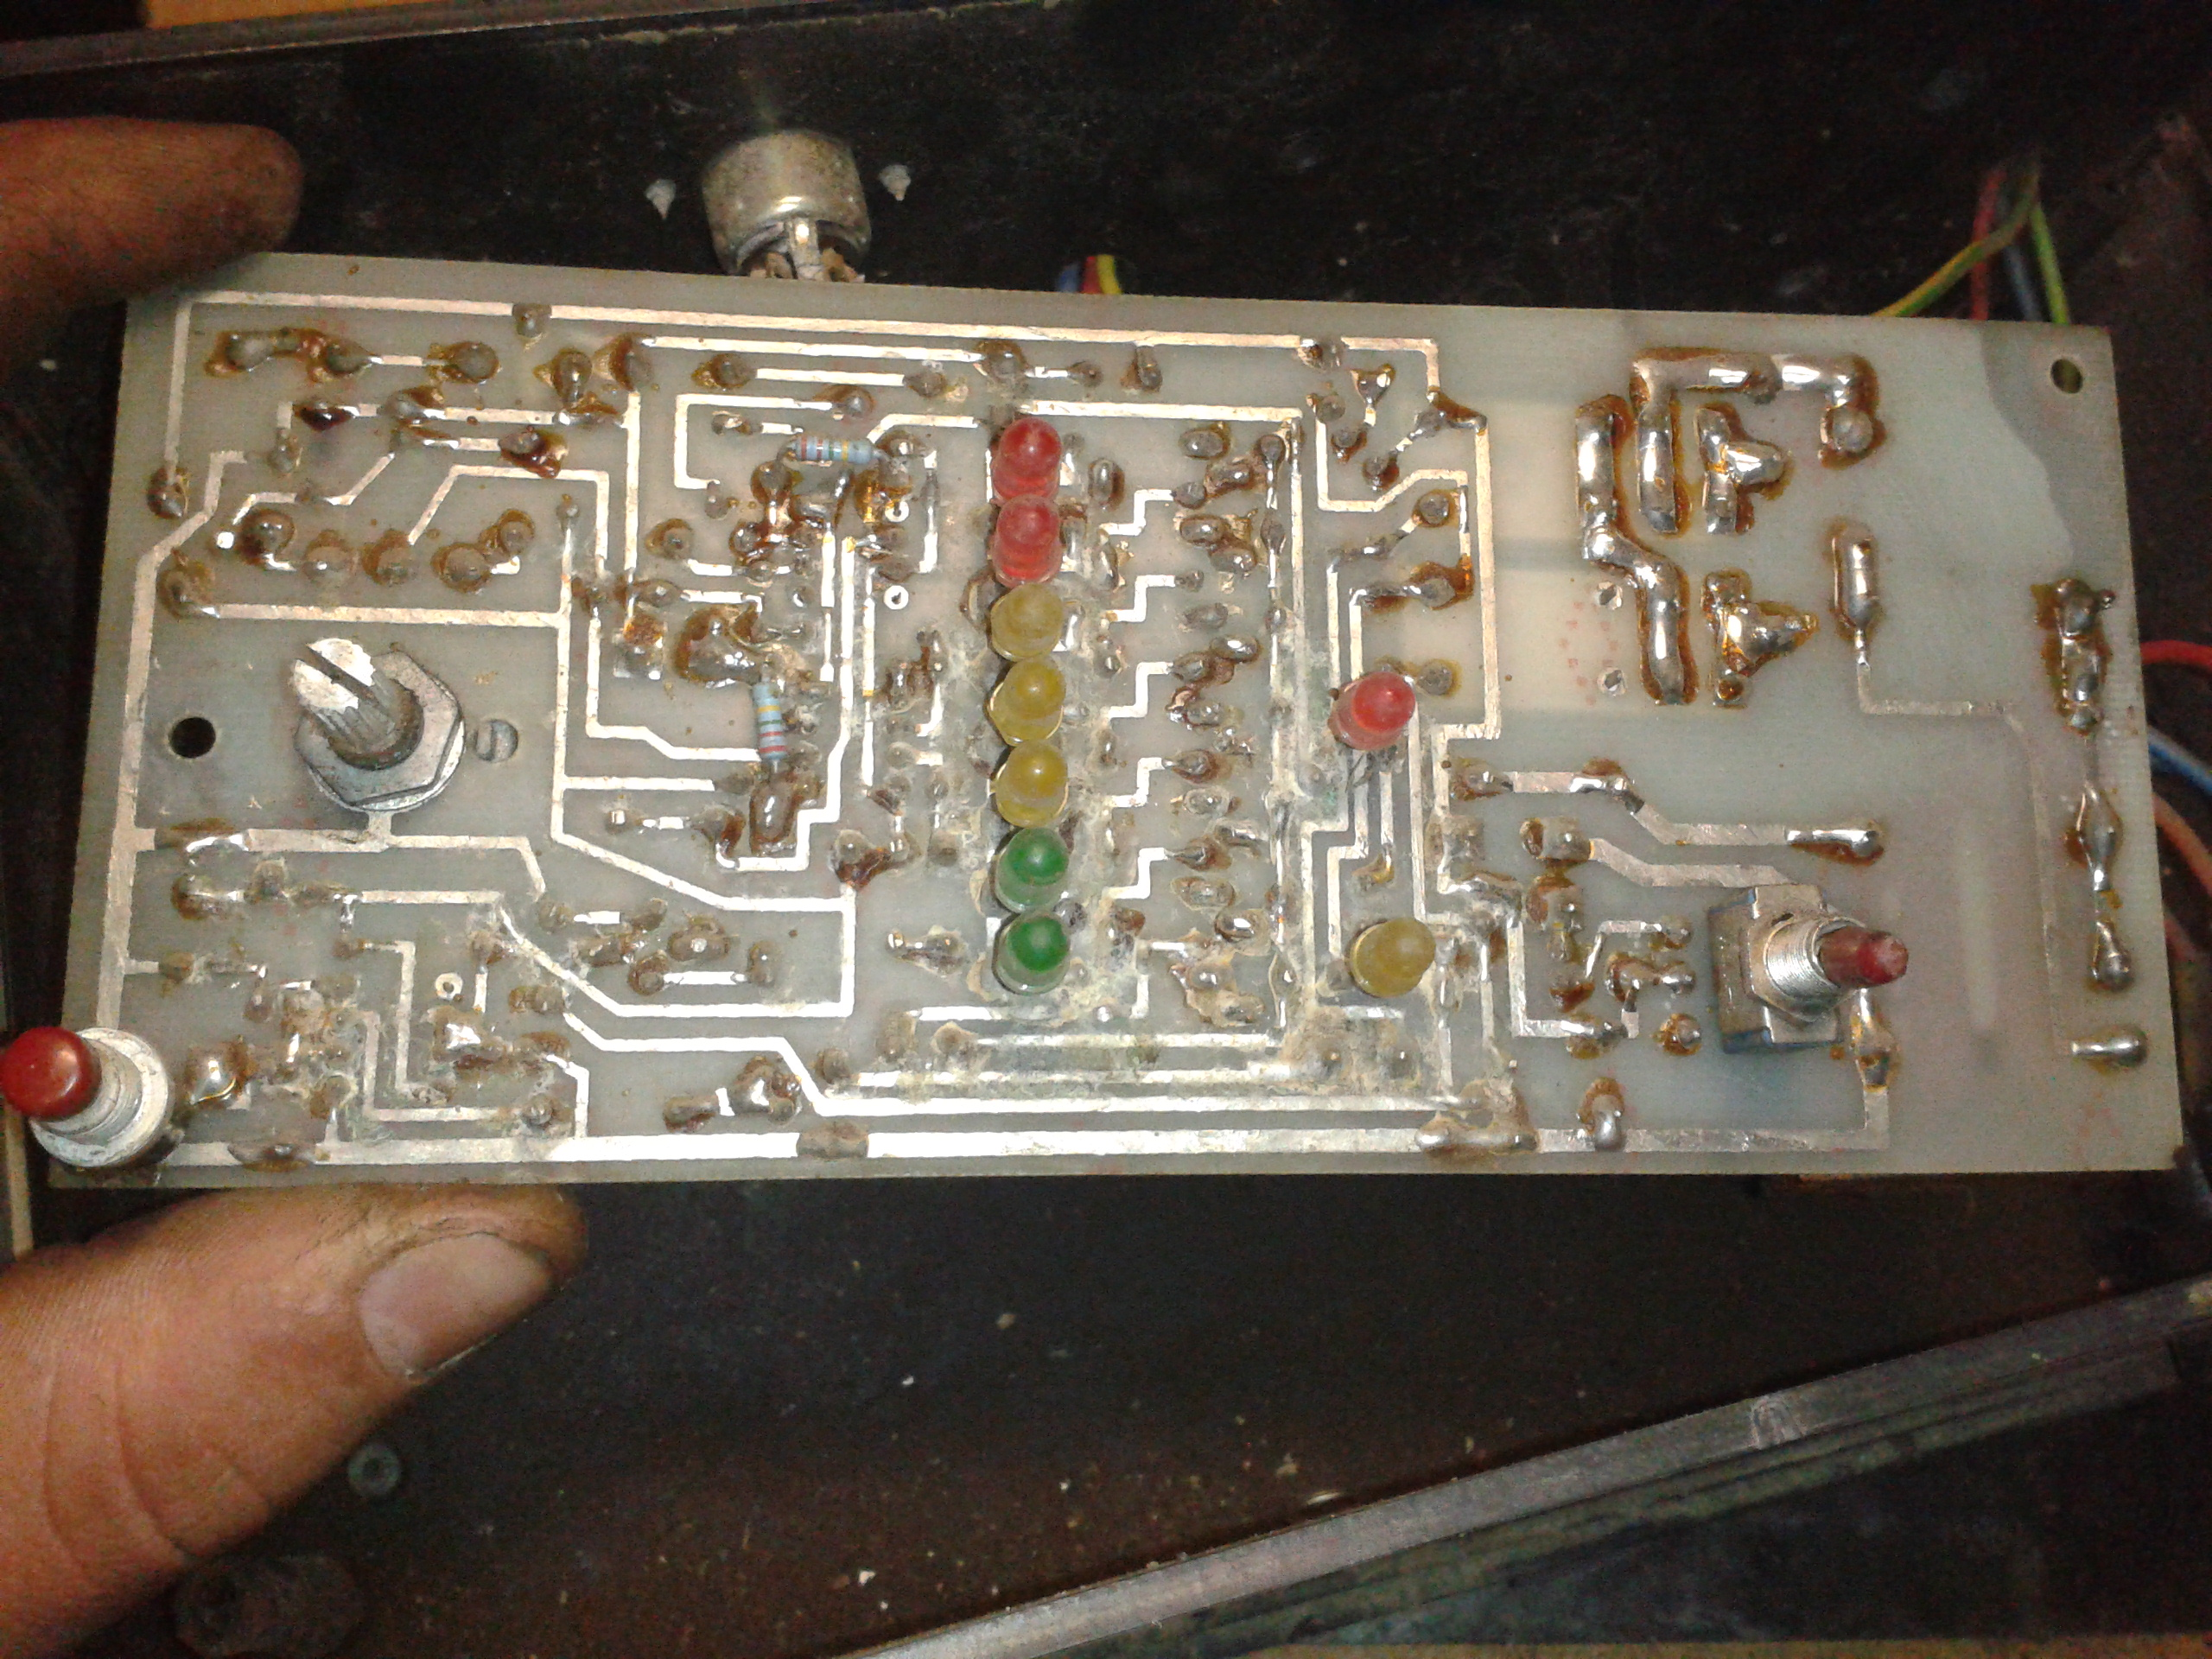 sterownik kot�a moderator,kotniz,stabilizator SCOMN - szukam instrukcji